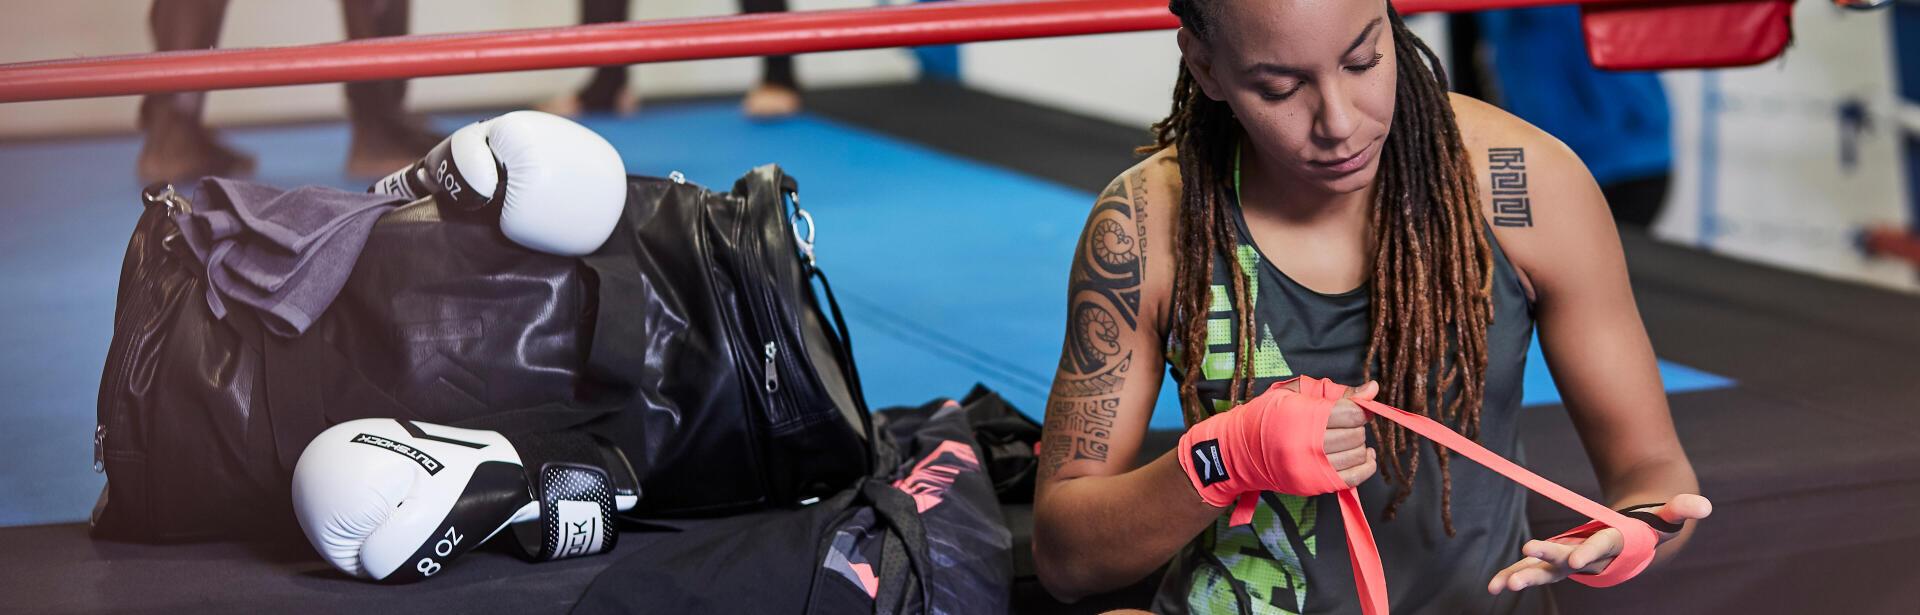 boxe, kickboxing e muay thai